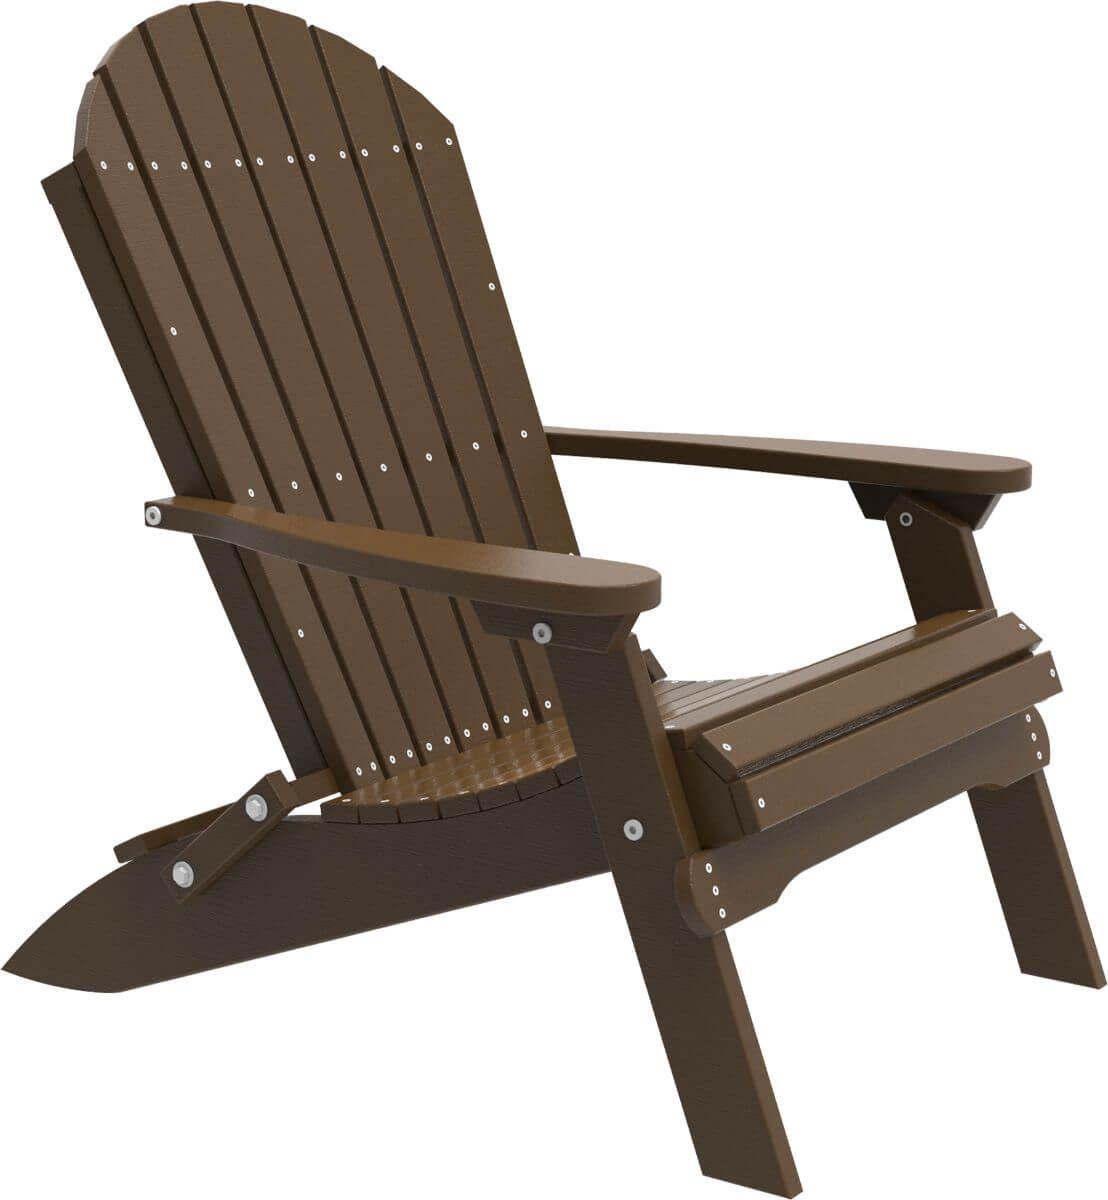 Chestnut Brown Tahiti Folding Adirondack Chair